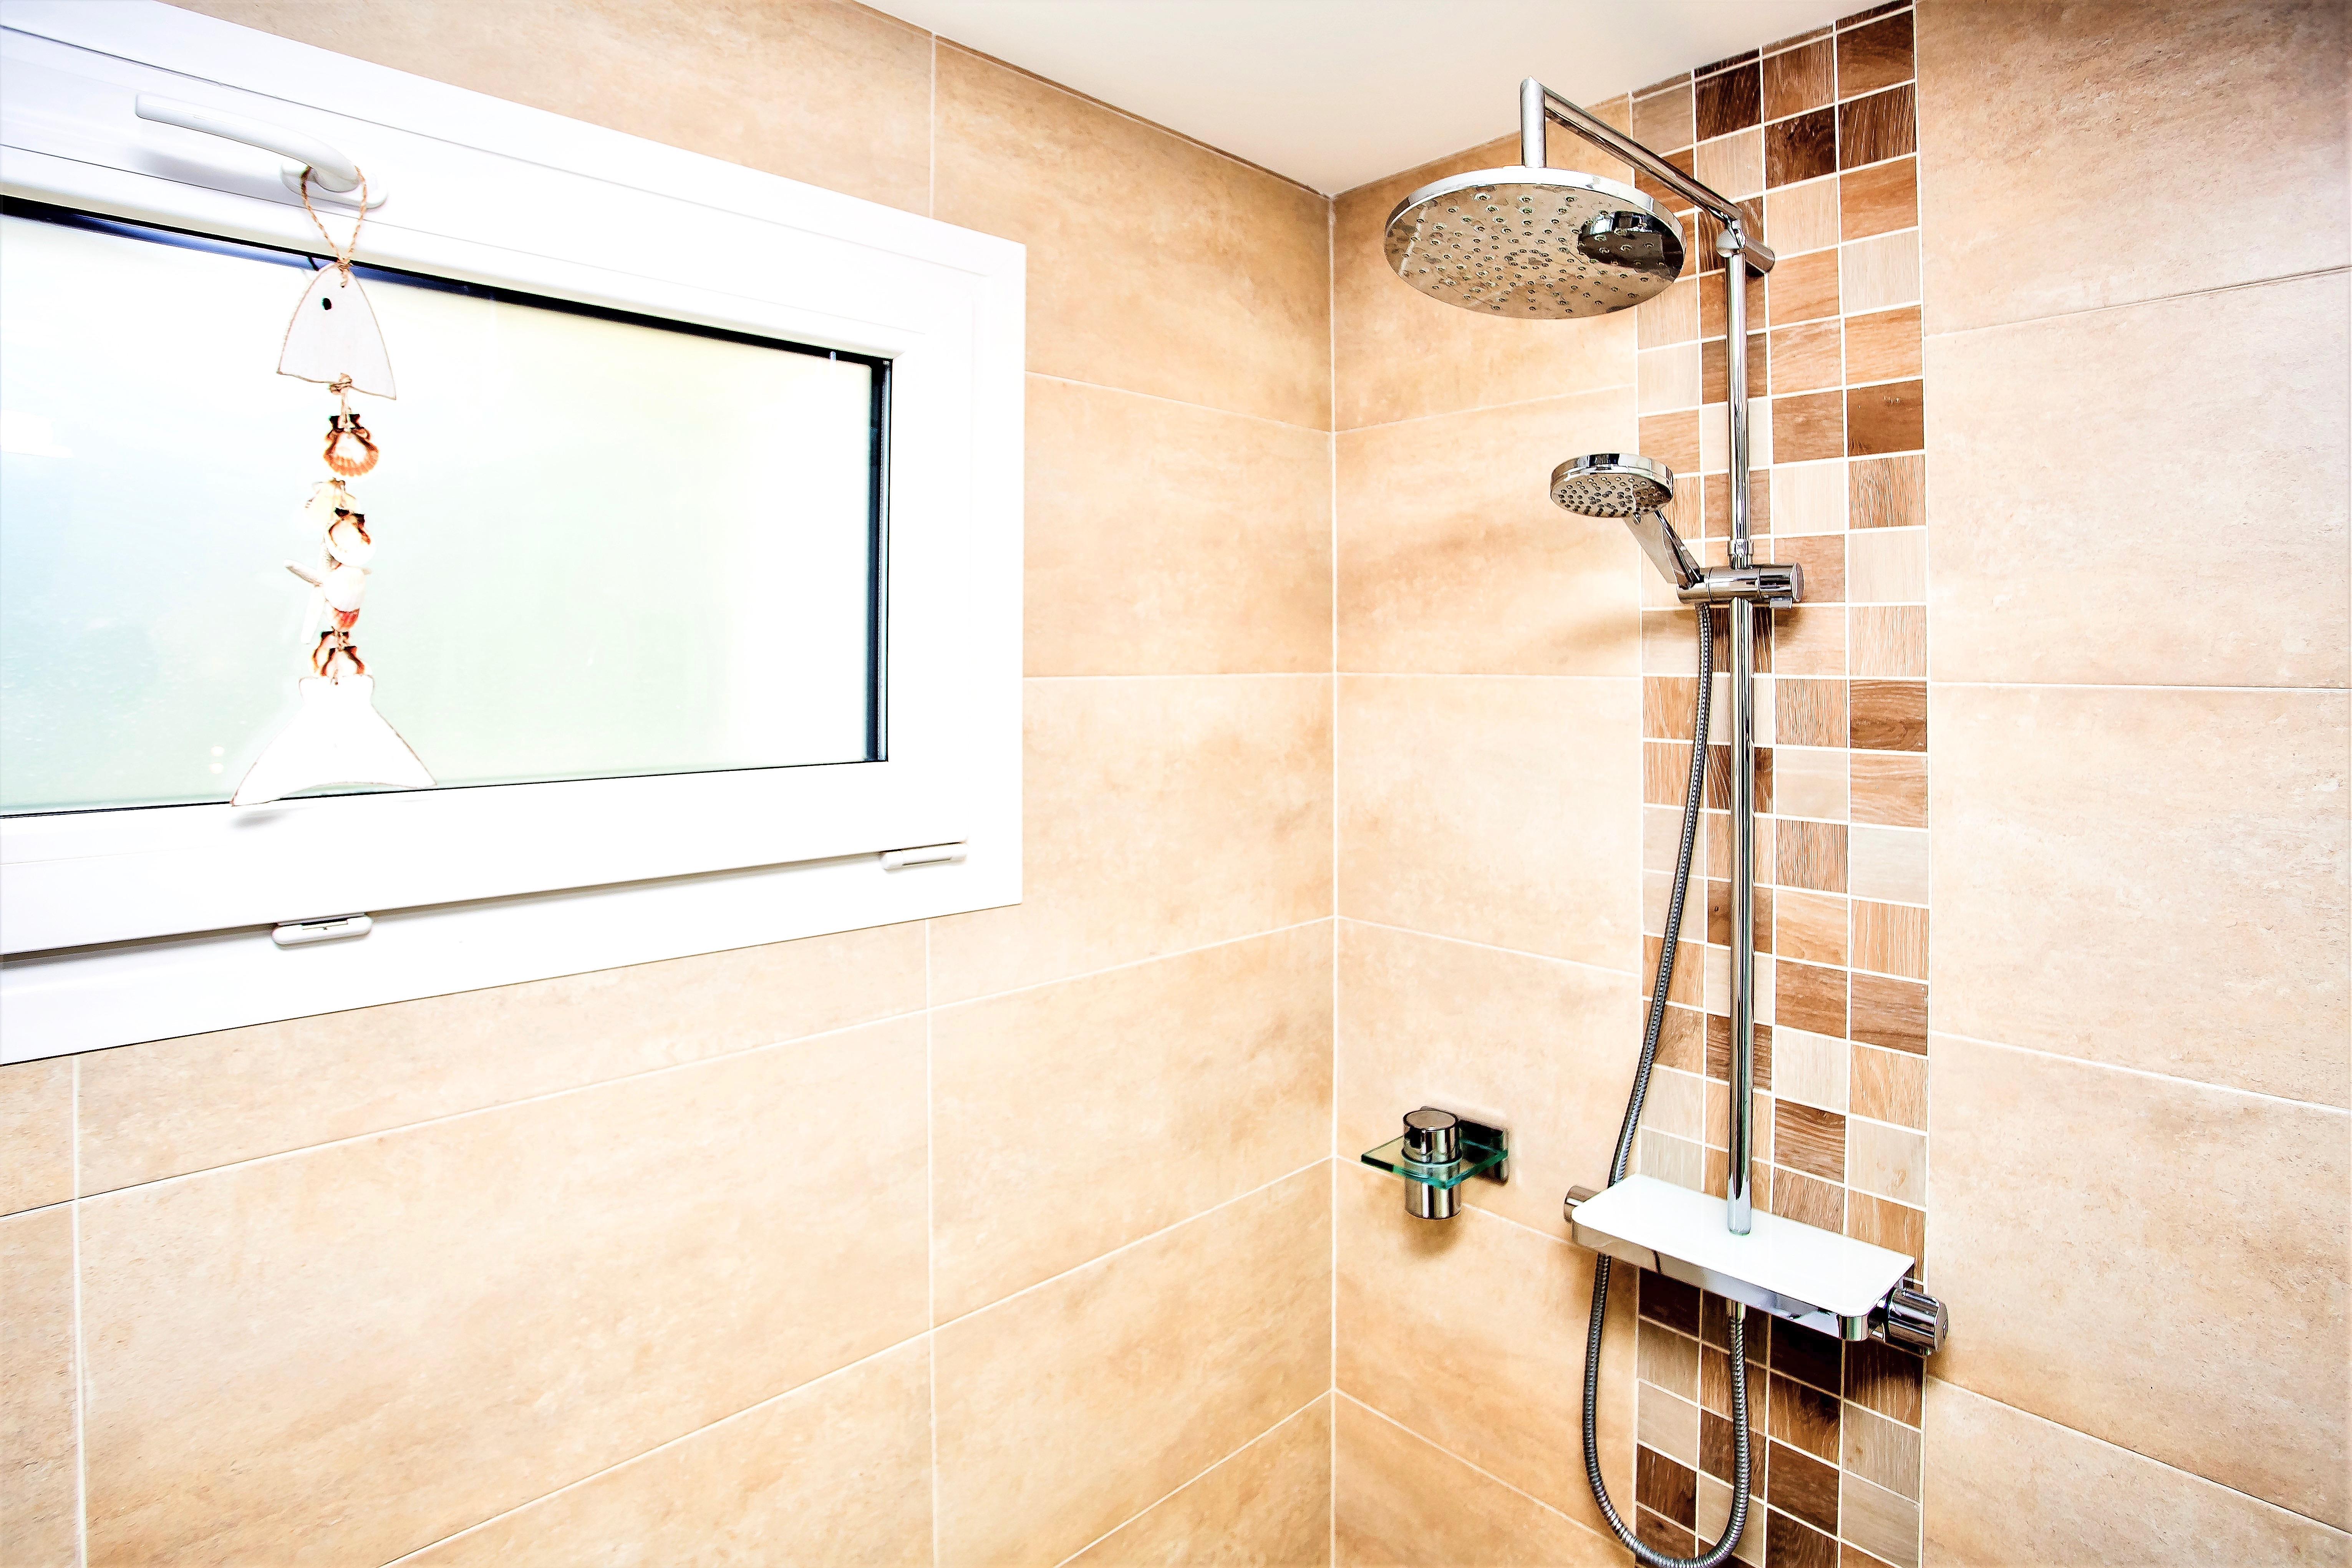 Apartment 8 Bedroom VILLA BY PUERTO BANUS   SEA 5 min                                photo 16956472